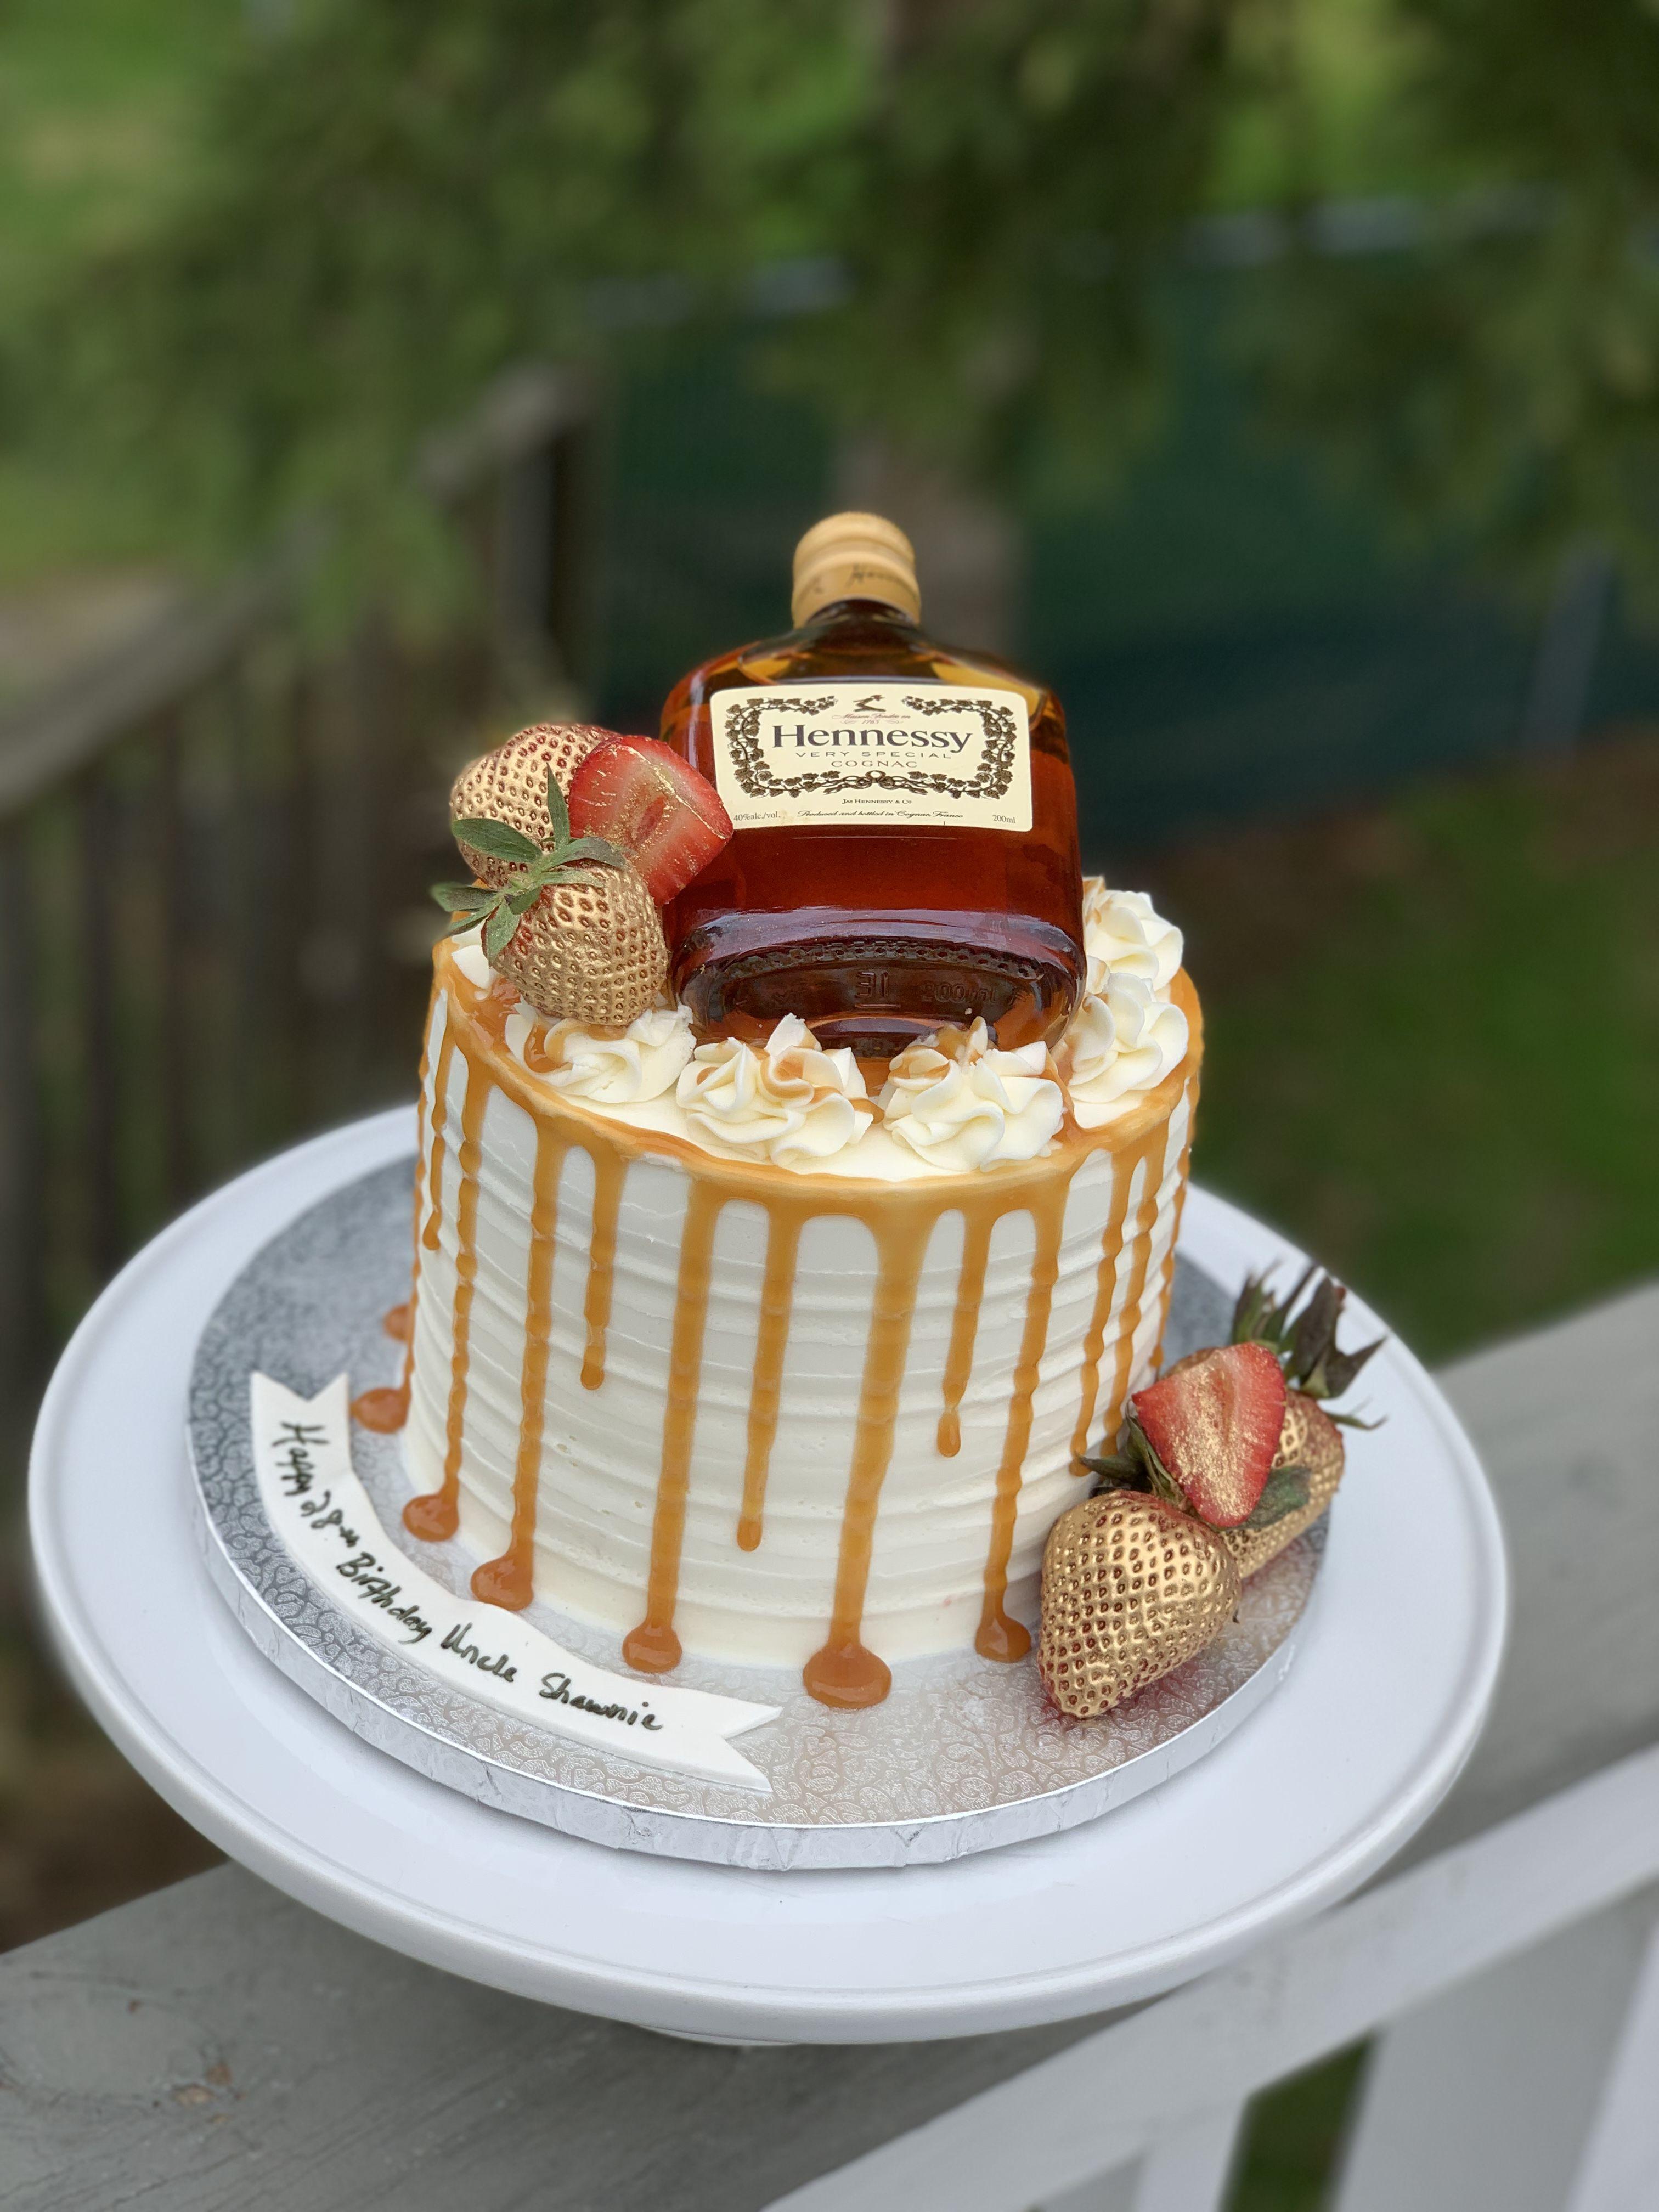 ℋℯ𝓃𝓃ℯ𝓈𝓈𝓎 𝒸𝒶𝓇𝒶𝓂ℯ𝓁 𝒹𝓇𝒾𝓅 𝒸𝒶𝓀ℯ Birthday cake for boyfriend